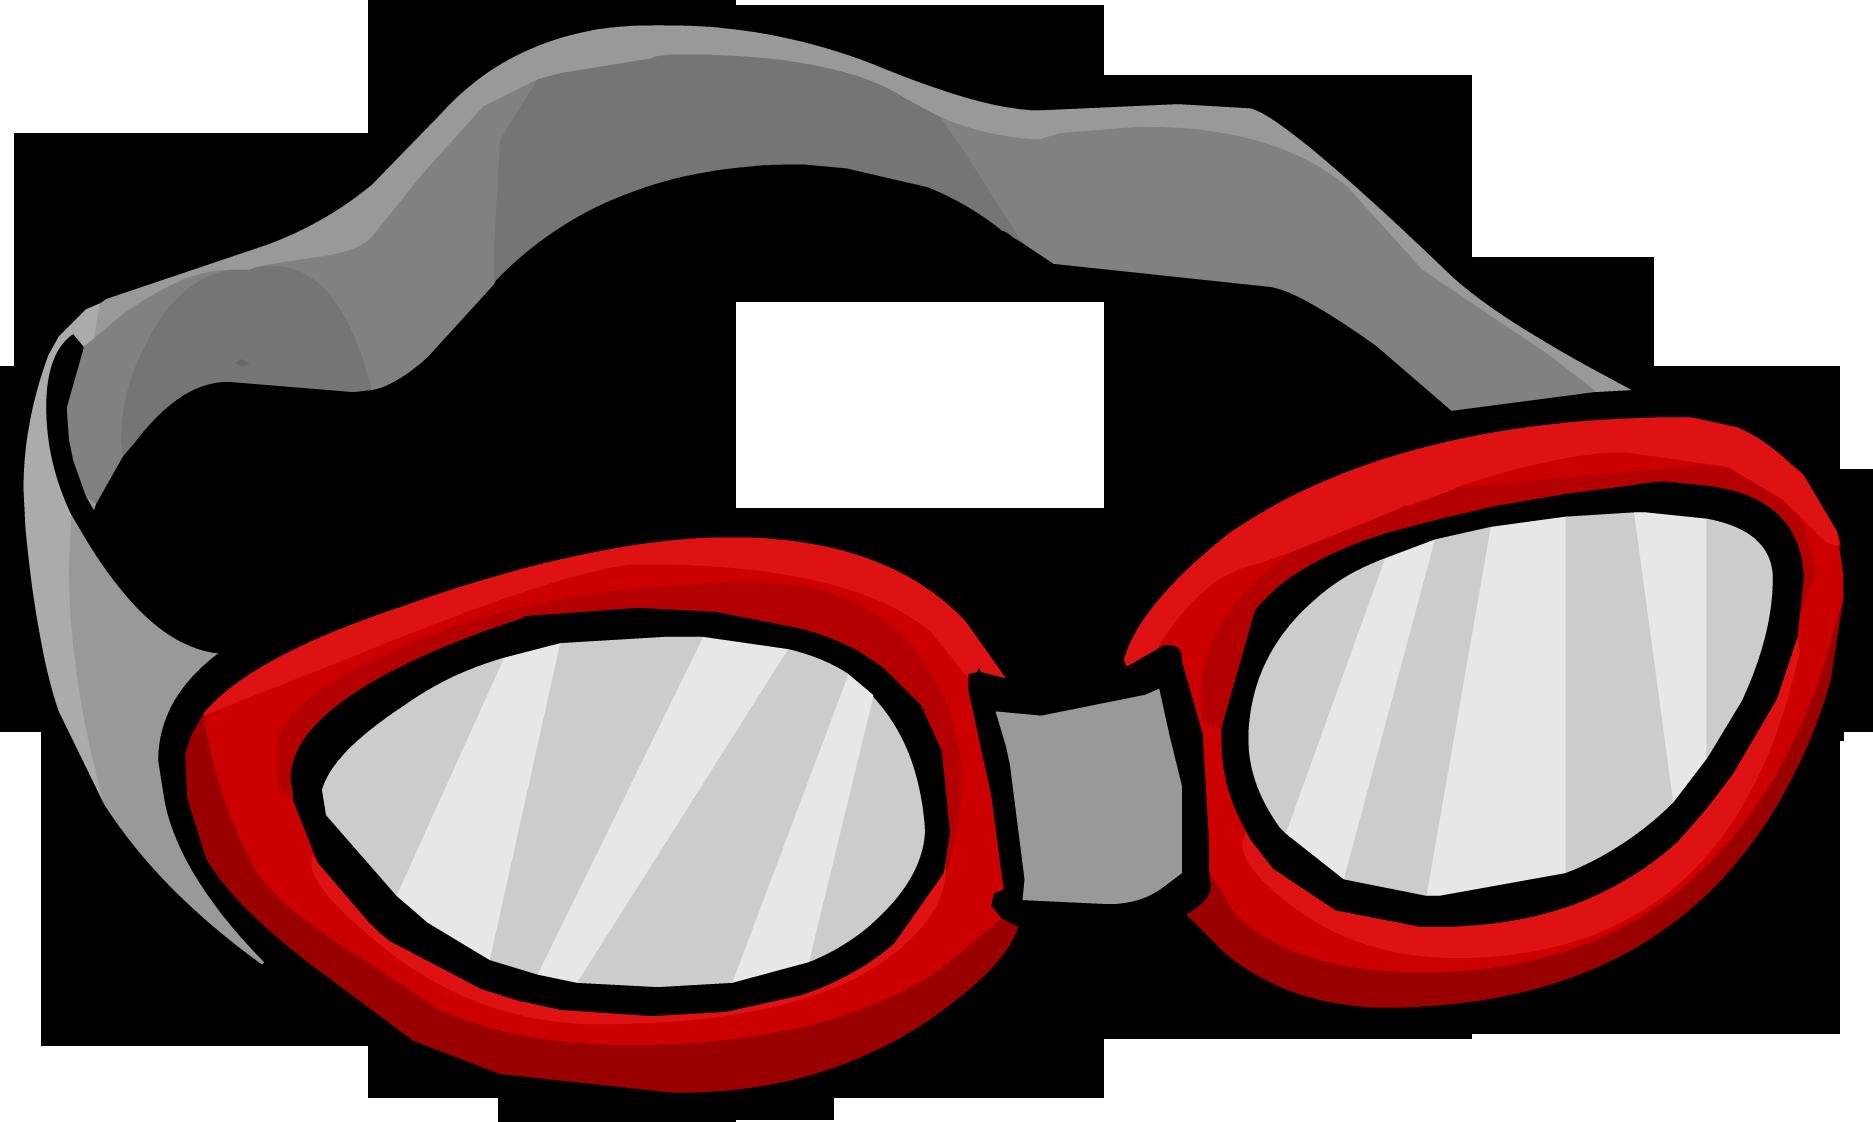 Clipart swimming goggles clip art library stock Swimming Goggles Clipart | Free download best Swimming Goggles ... clip art library stock